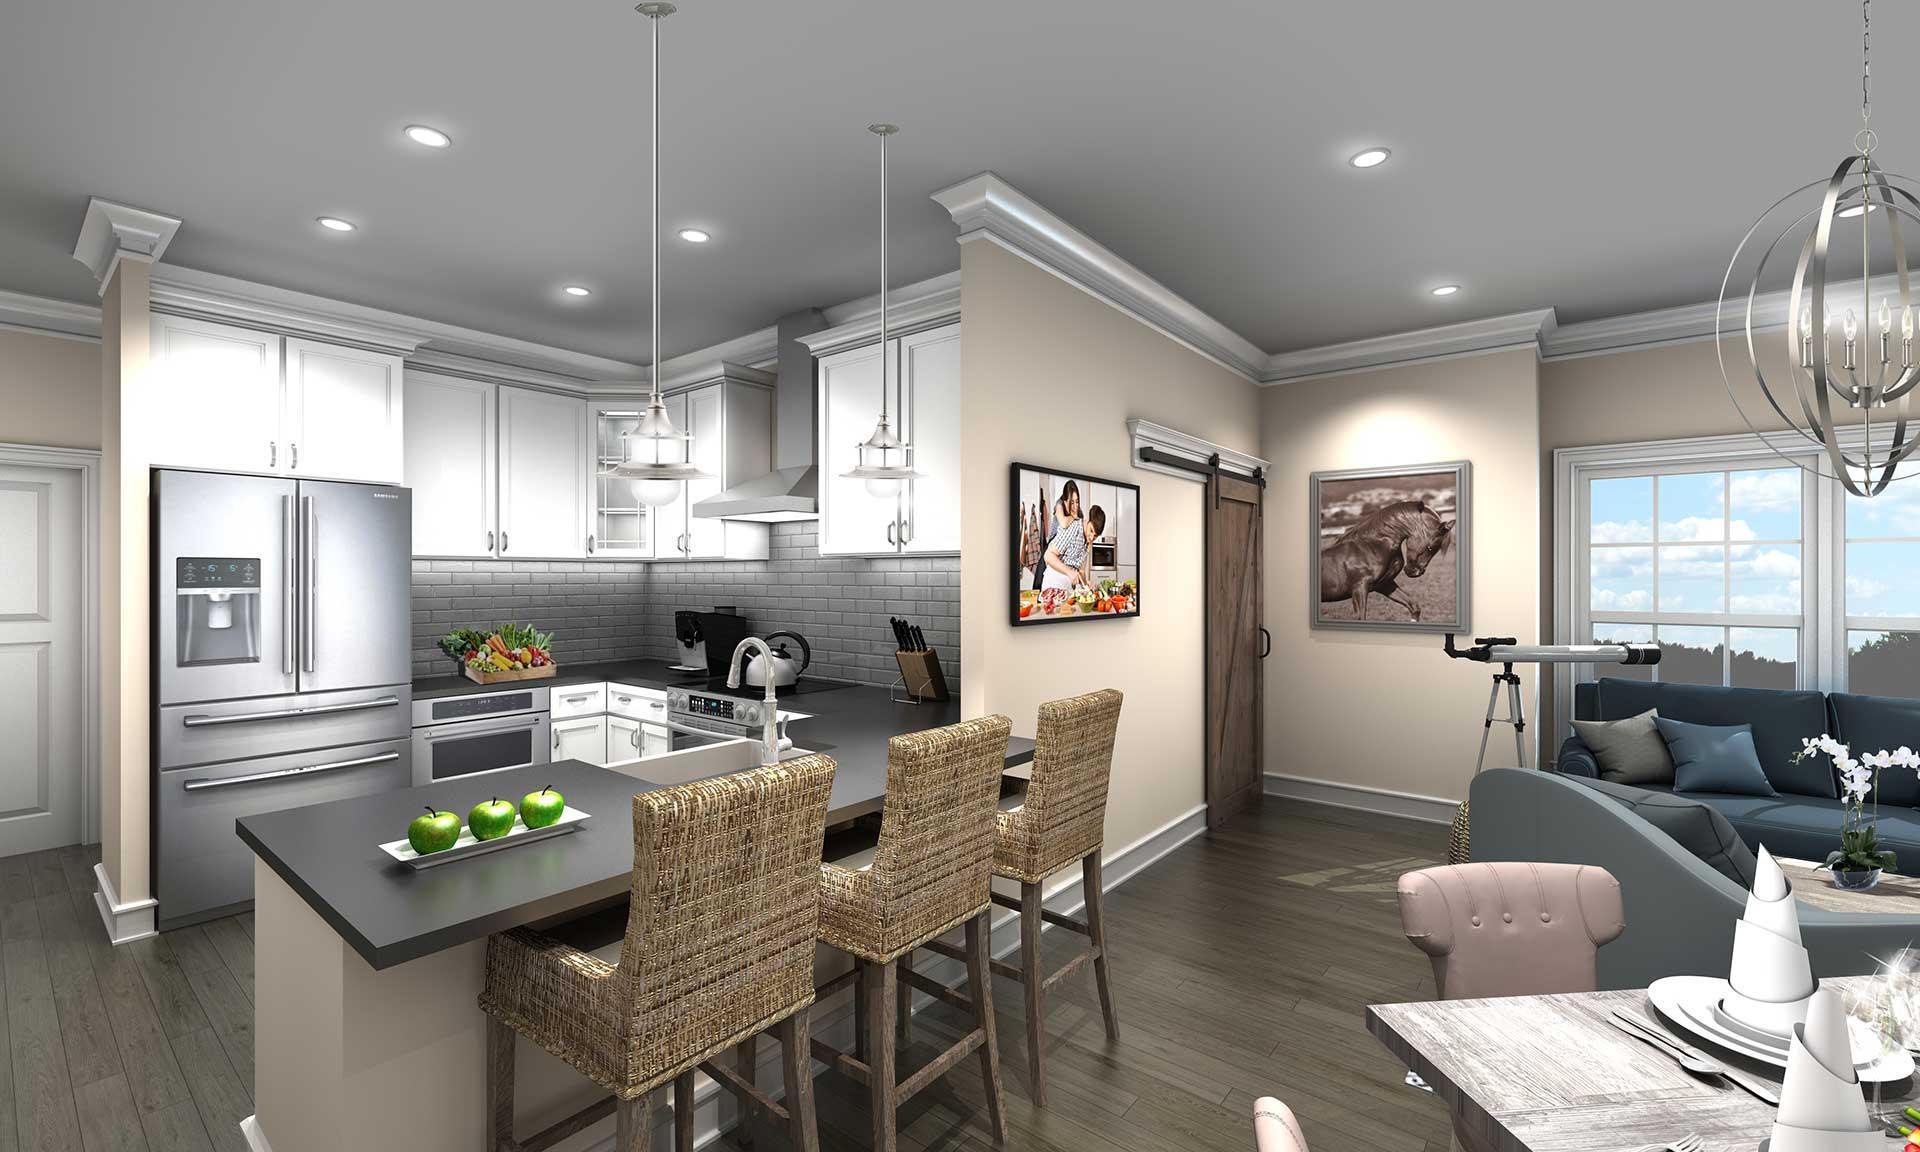 The Butterfield Condominium:Community